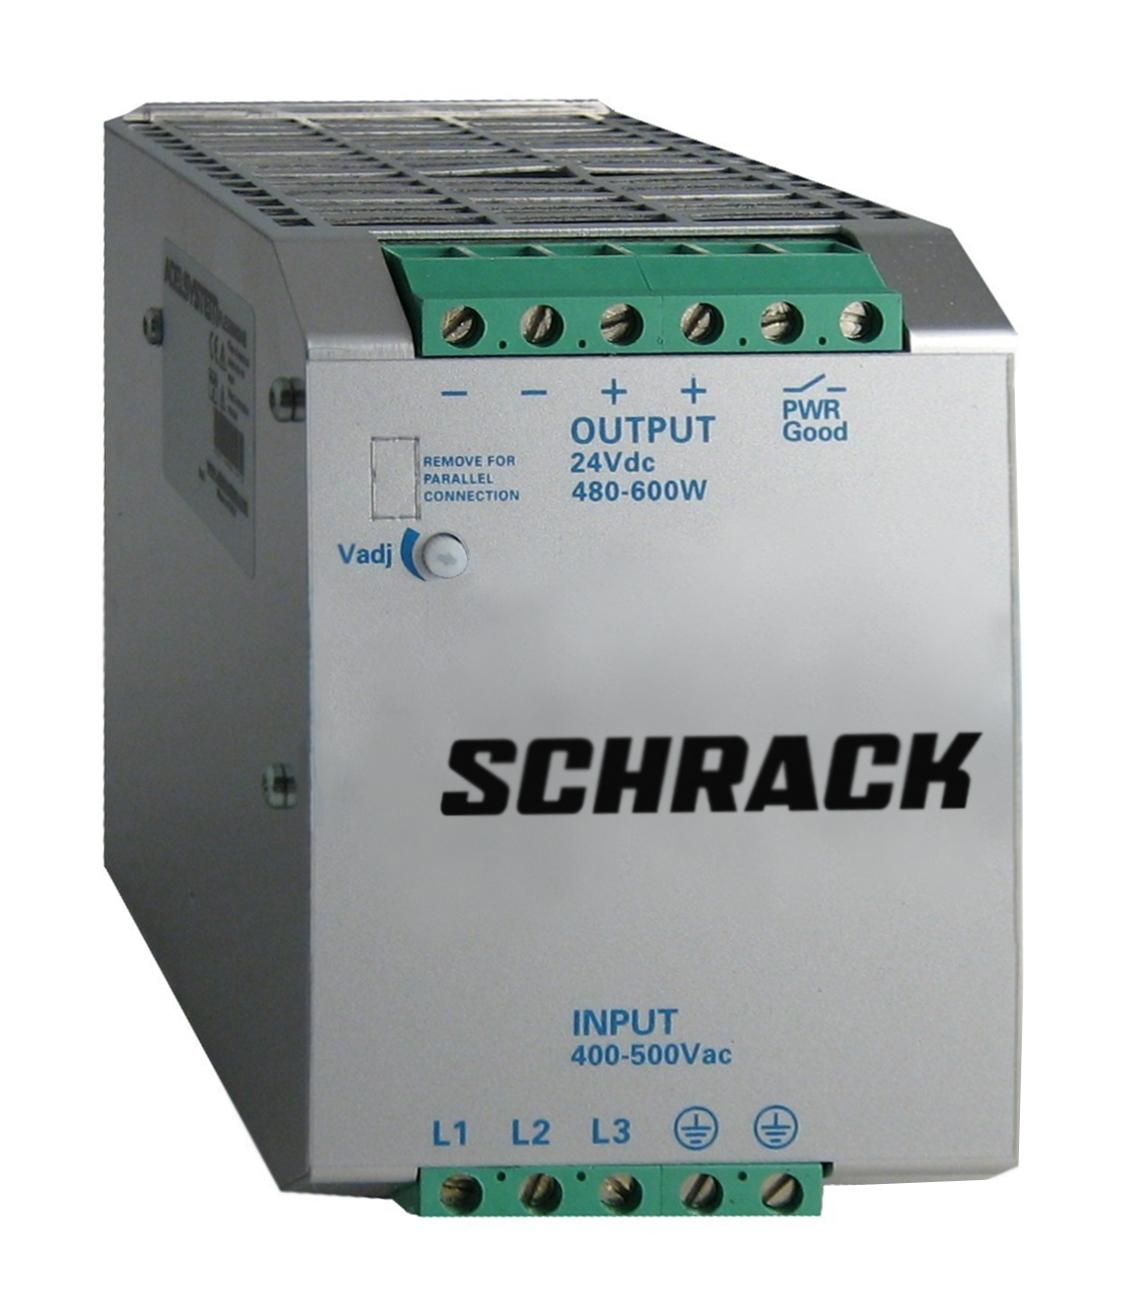 1 Stk Dreiphasiges Netzgerät getaktet, 400VAC/24VDC, 22A bei 50°C LP432422--